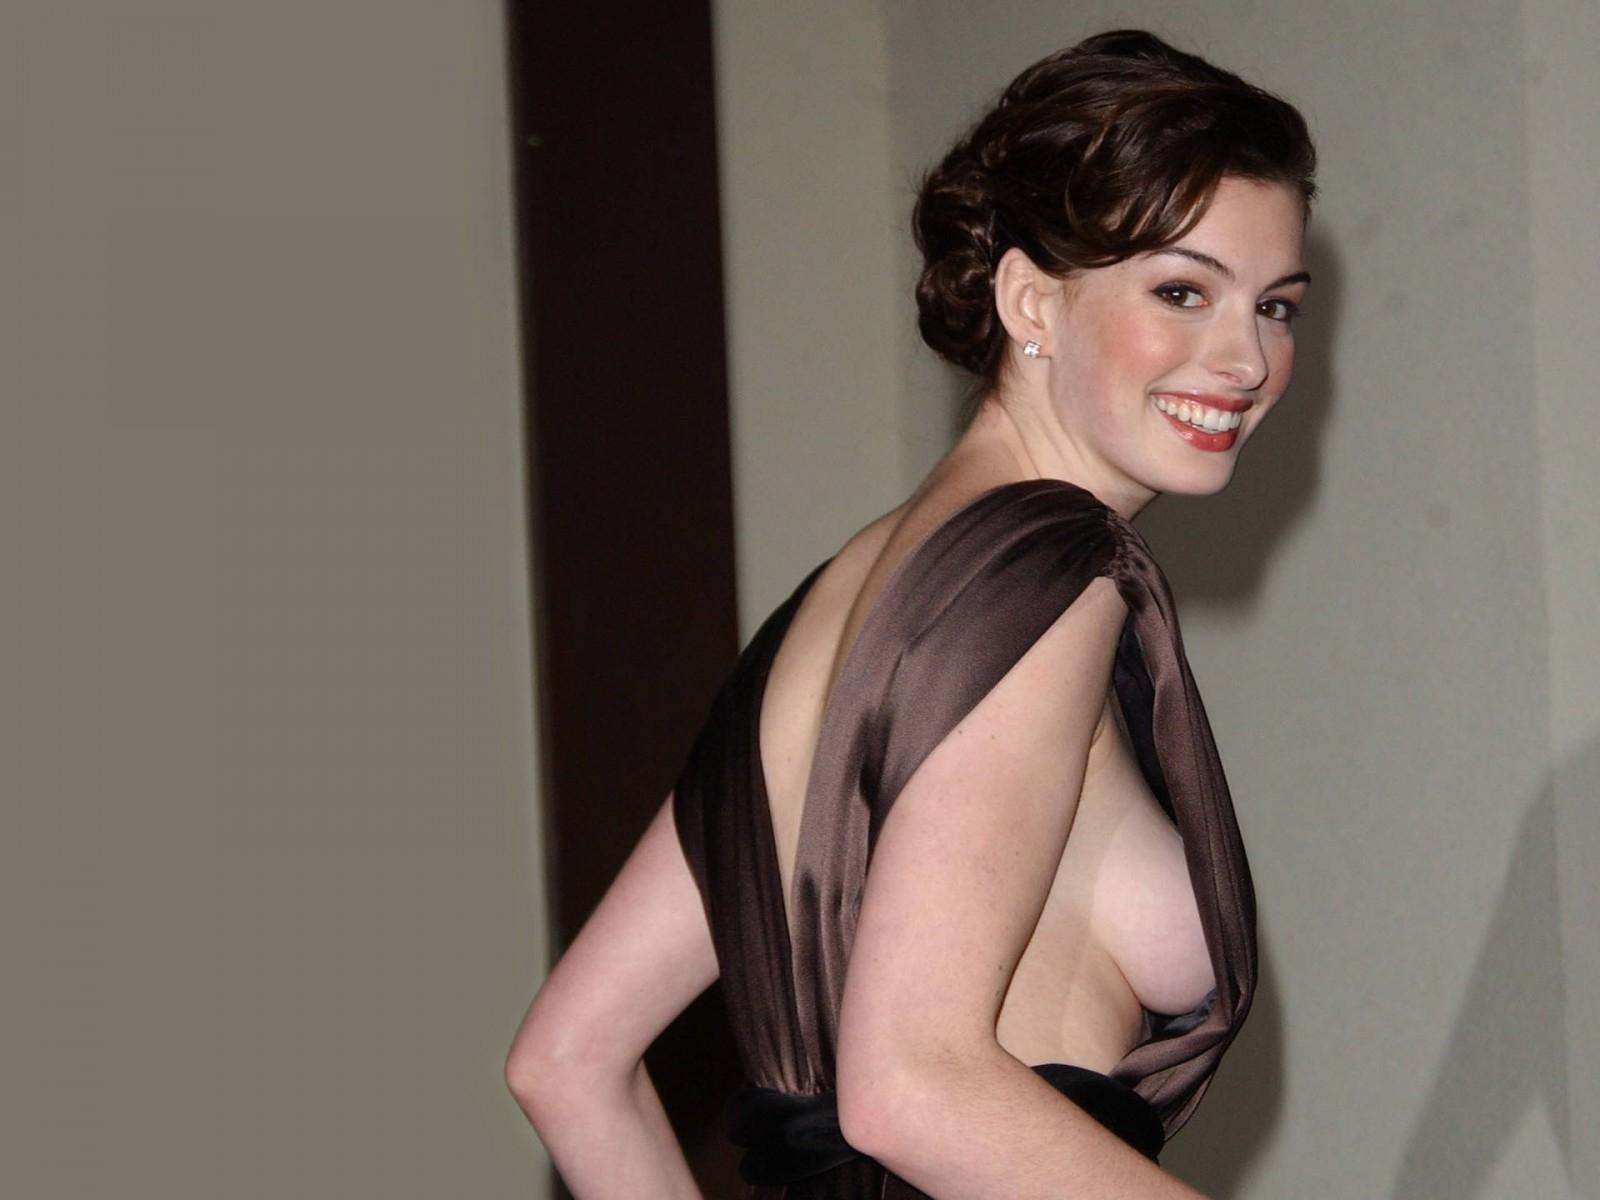 Wallpaper di Anne Hathaway - 12